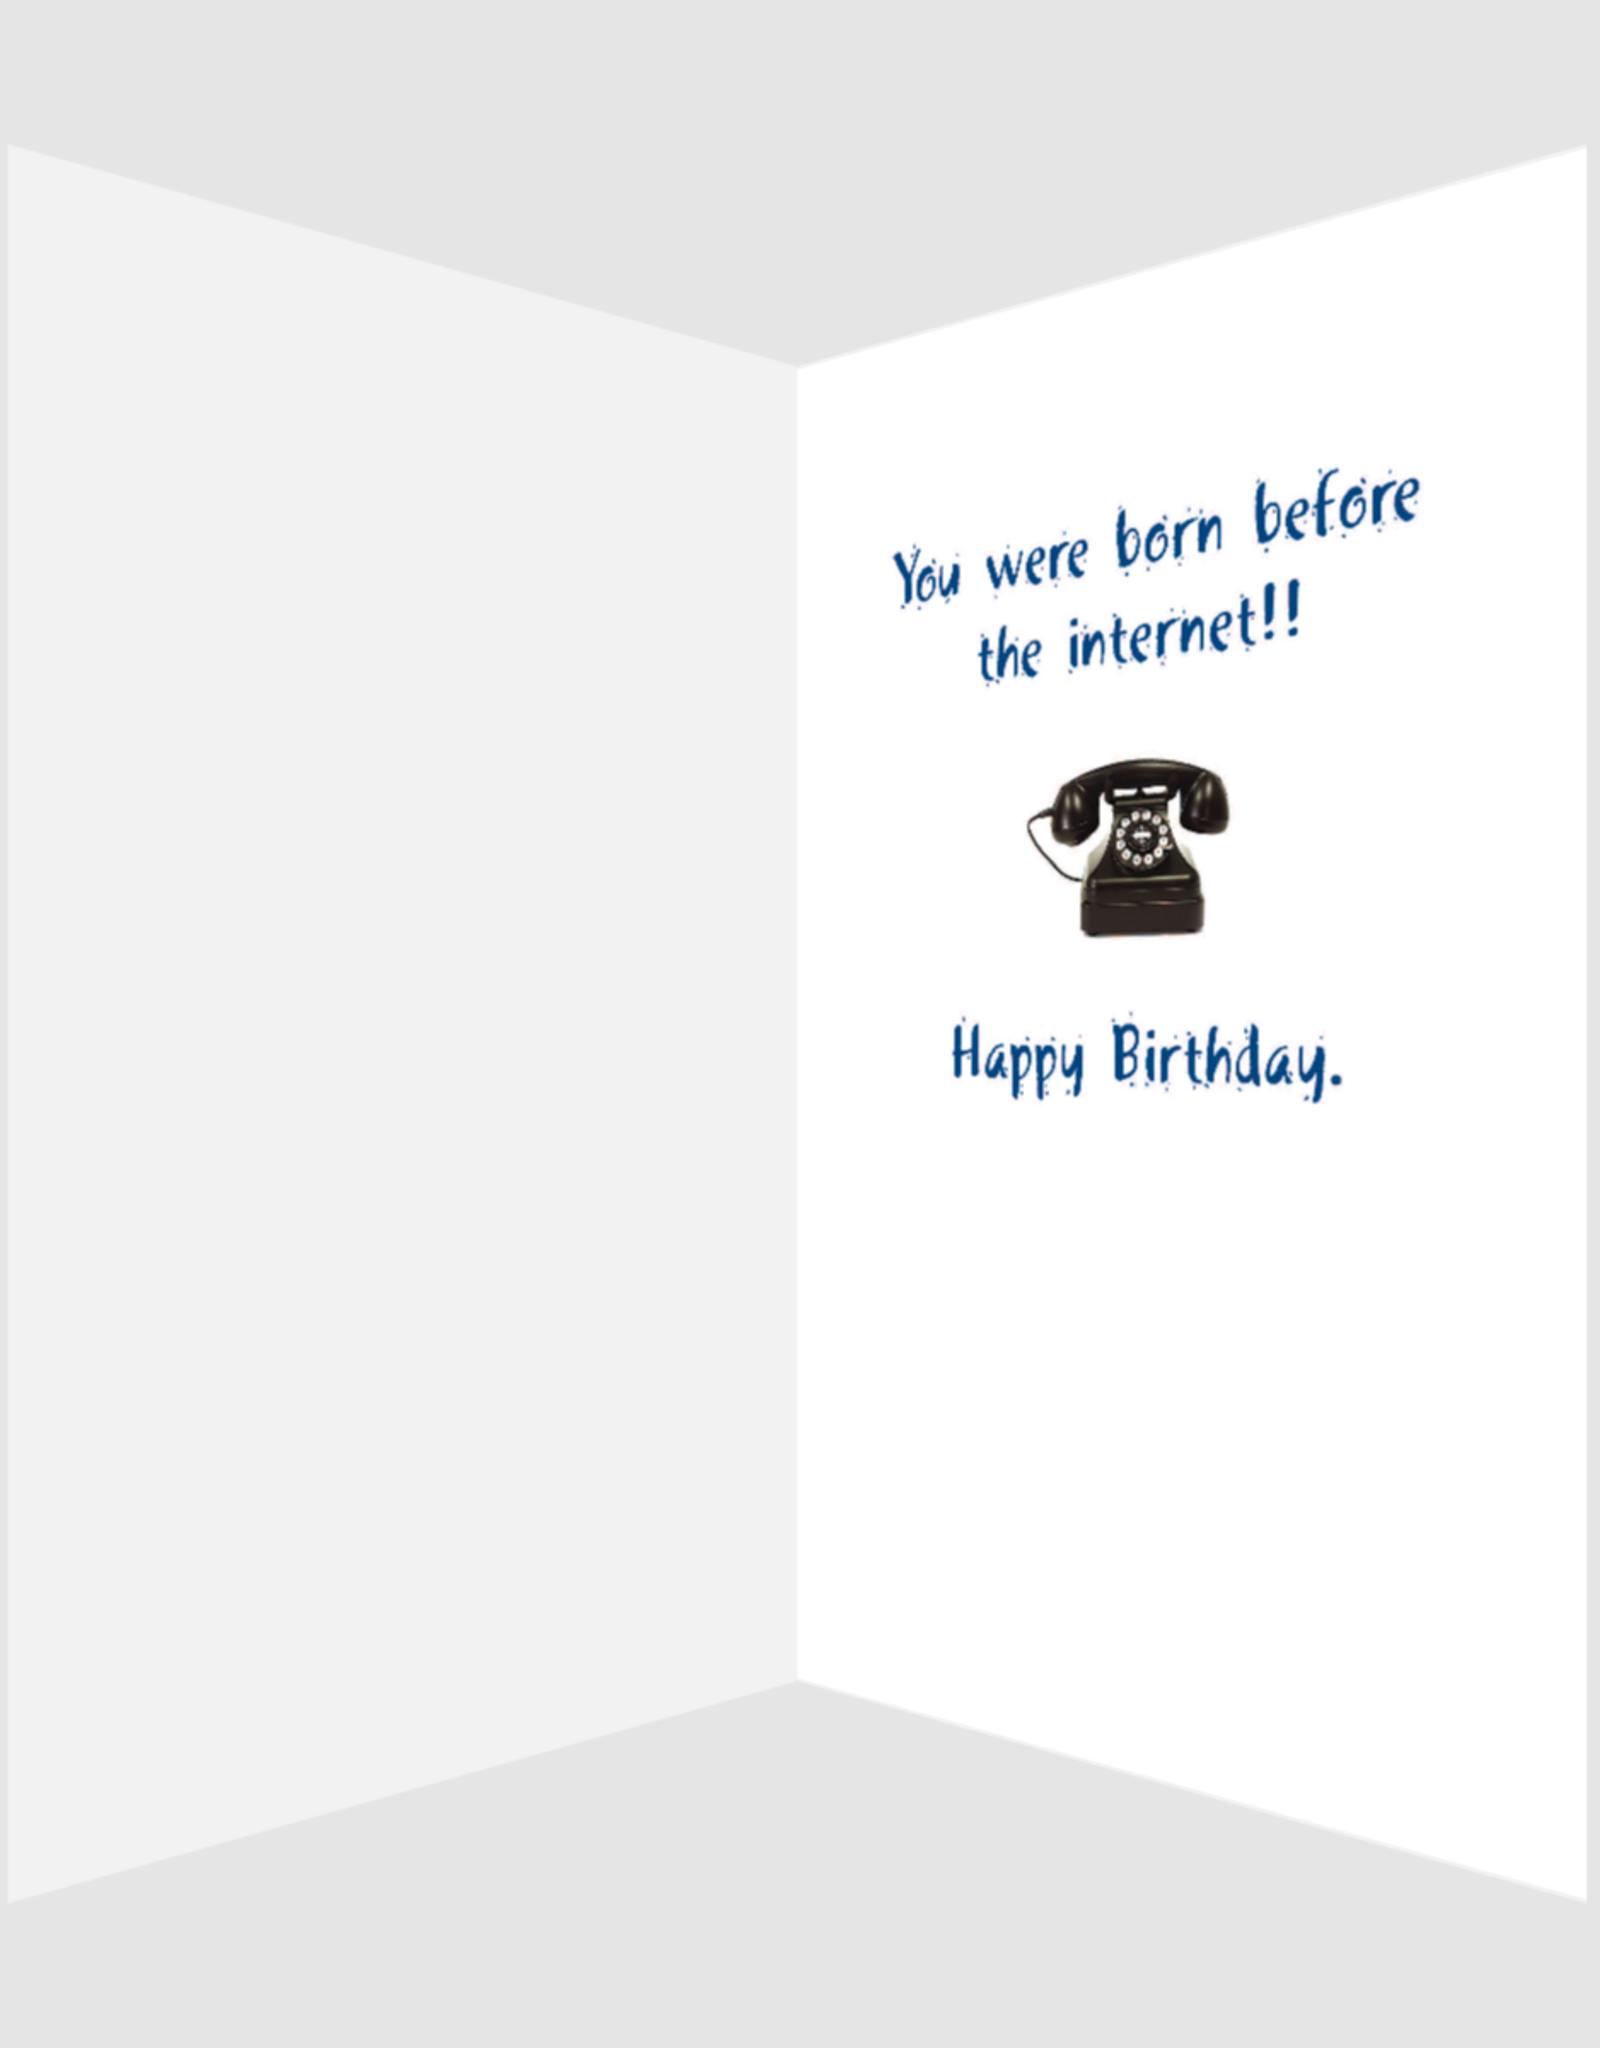 Dog Speak Dog Speak Card - Birthday - SHHH! Your secret is safe with me